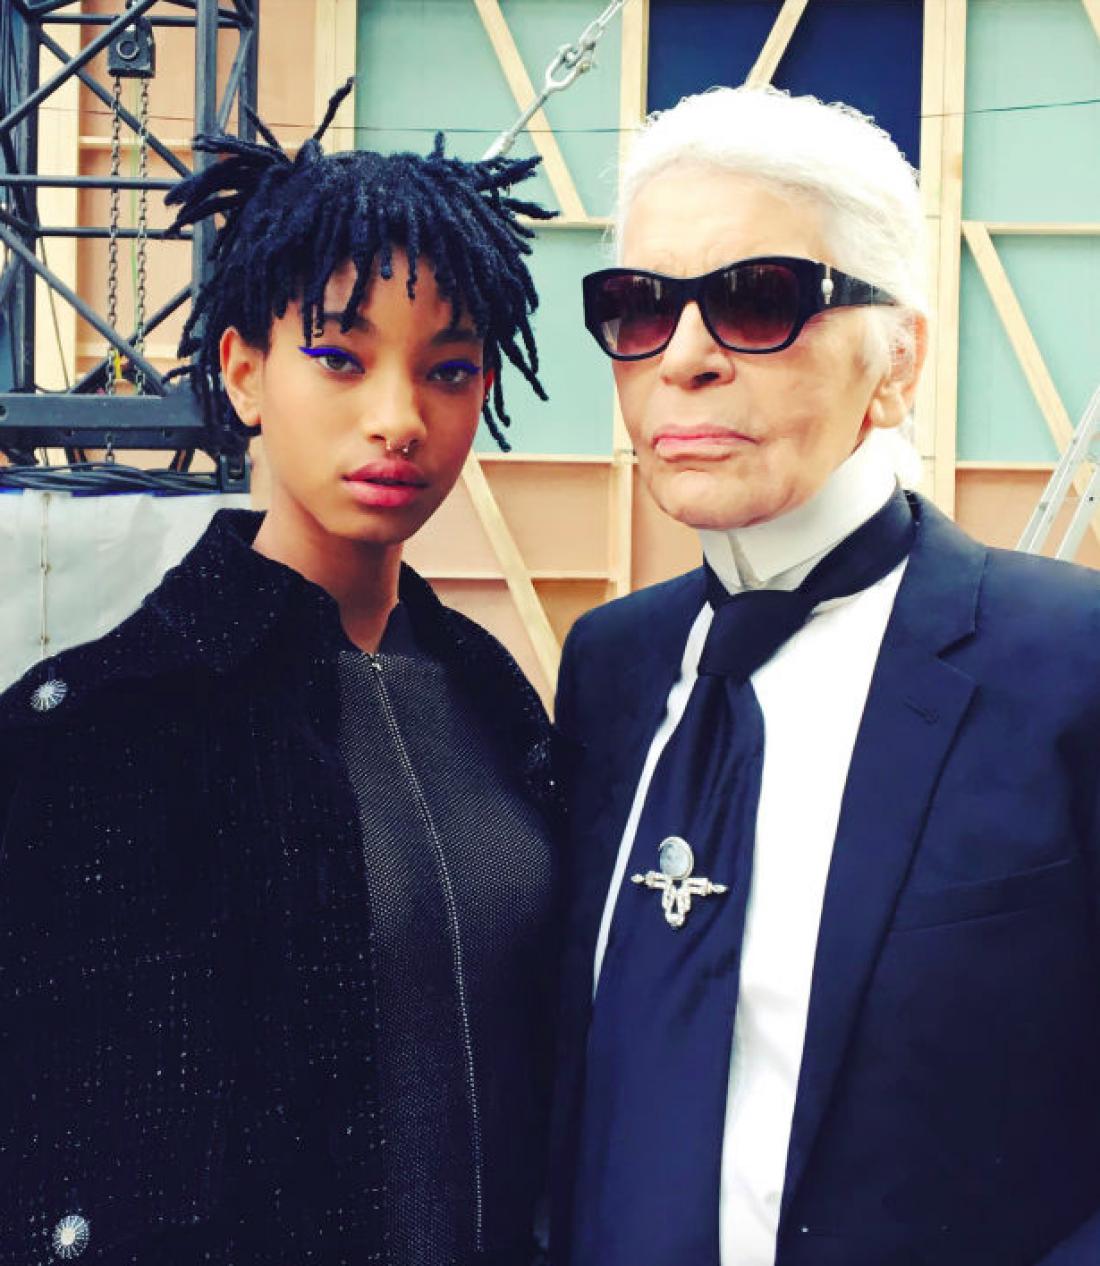 Дочь Уилла Смита стала послом Chanel